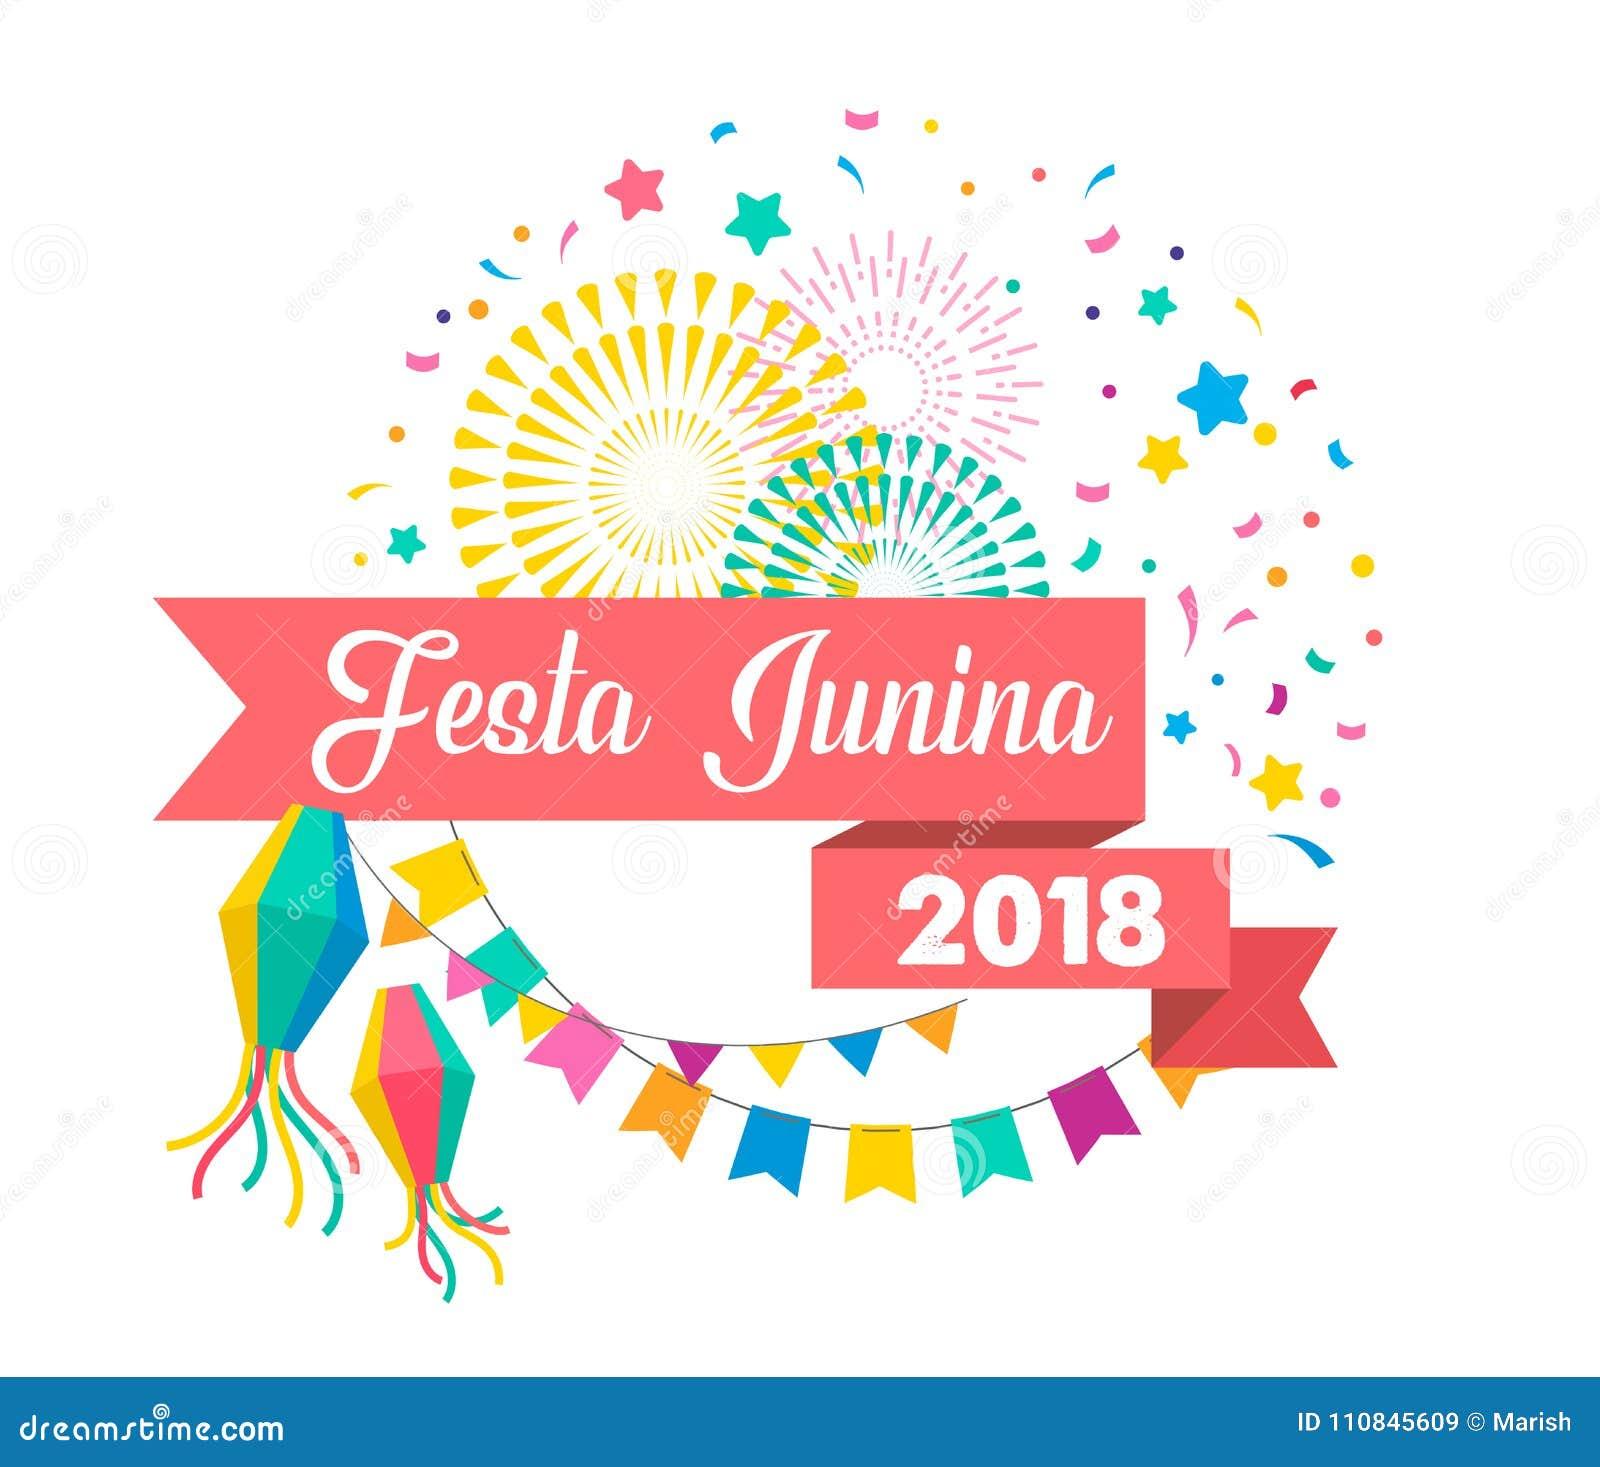 Festa Junina - Latijns-Amerikaans, Braziliaans Juni-Festival